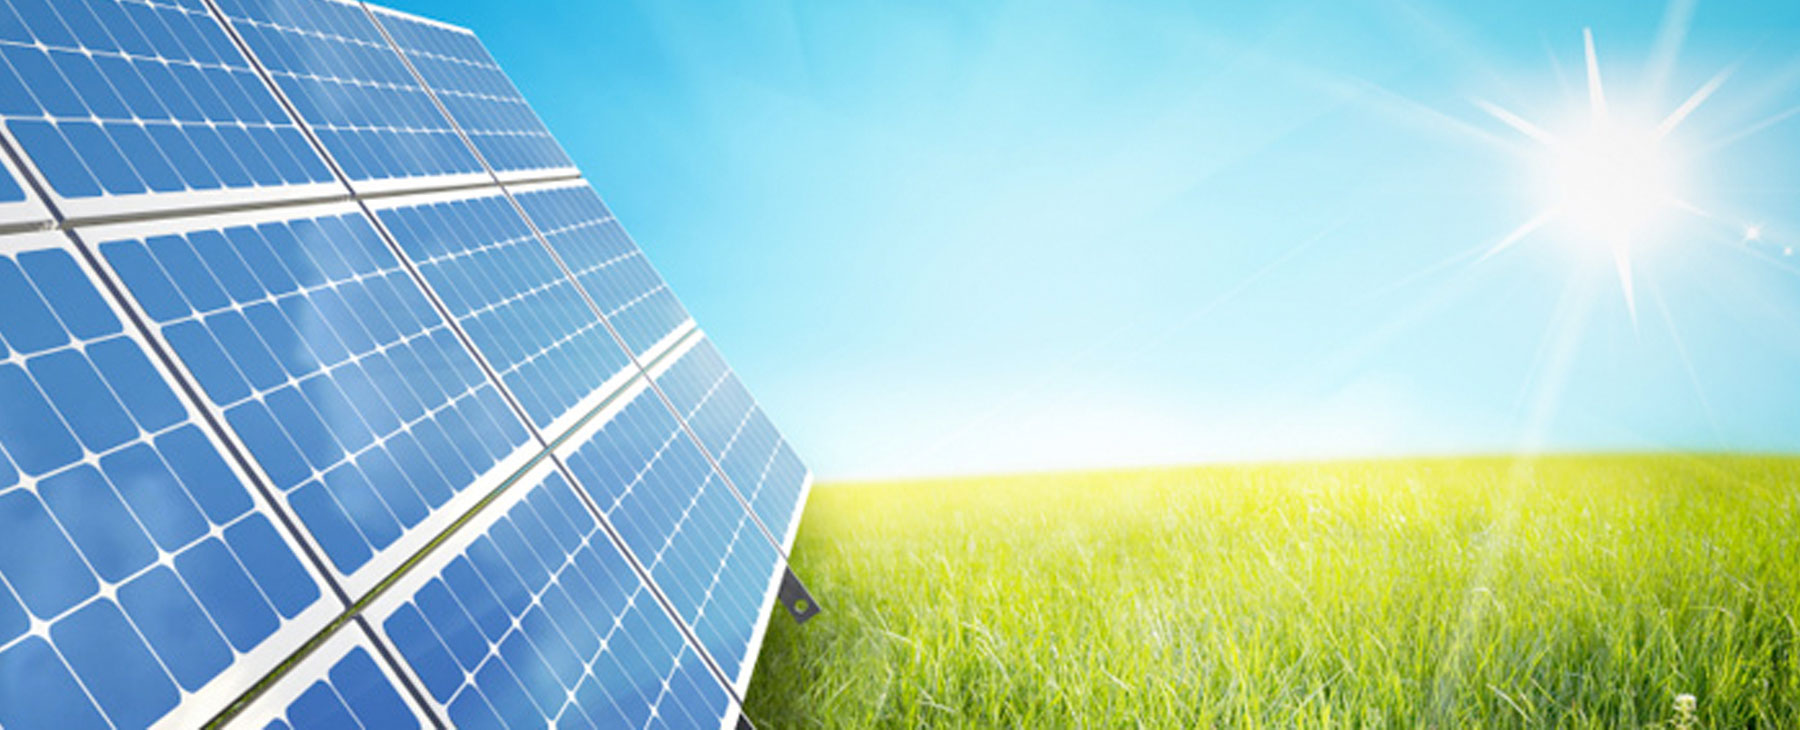 Sai Office Services - Solar